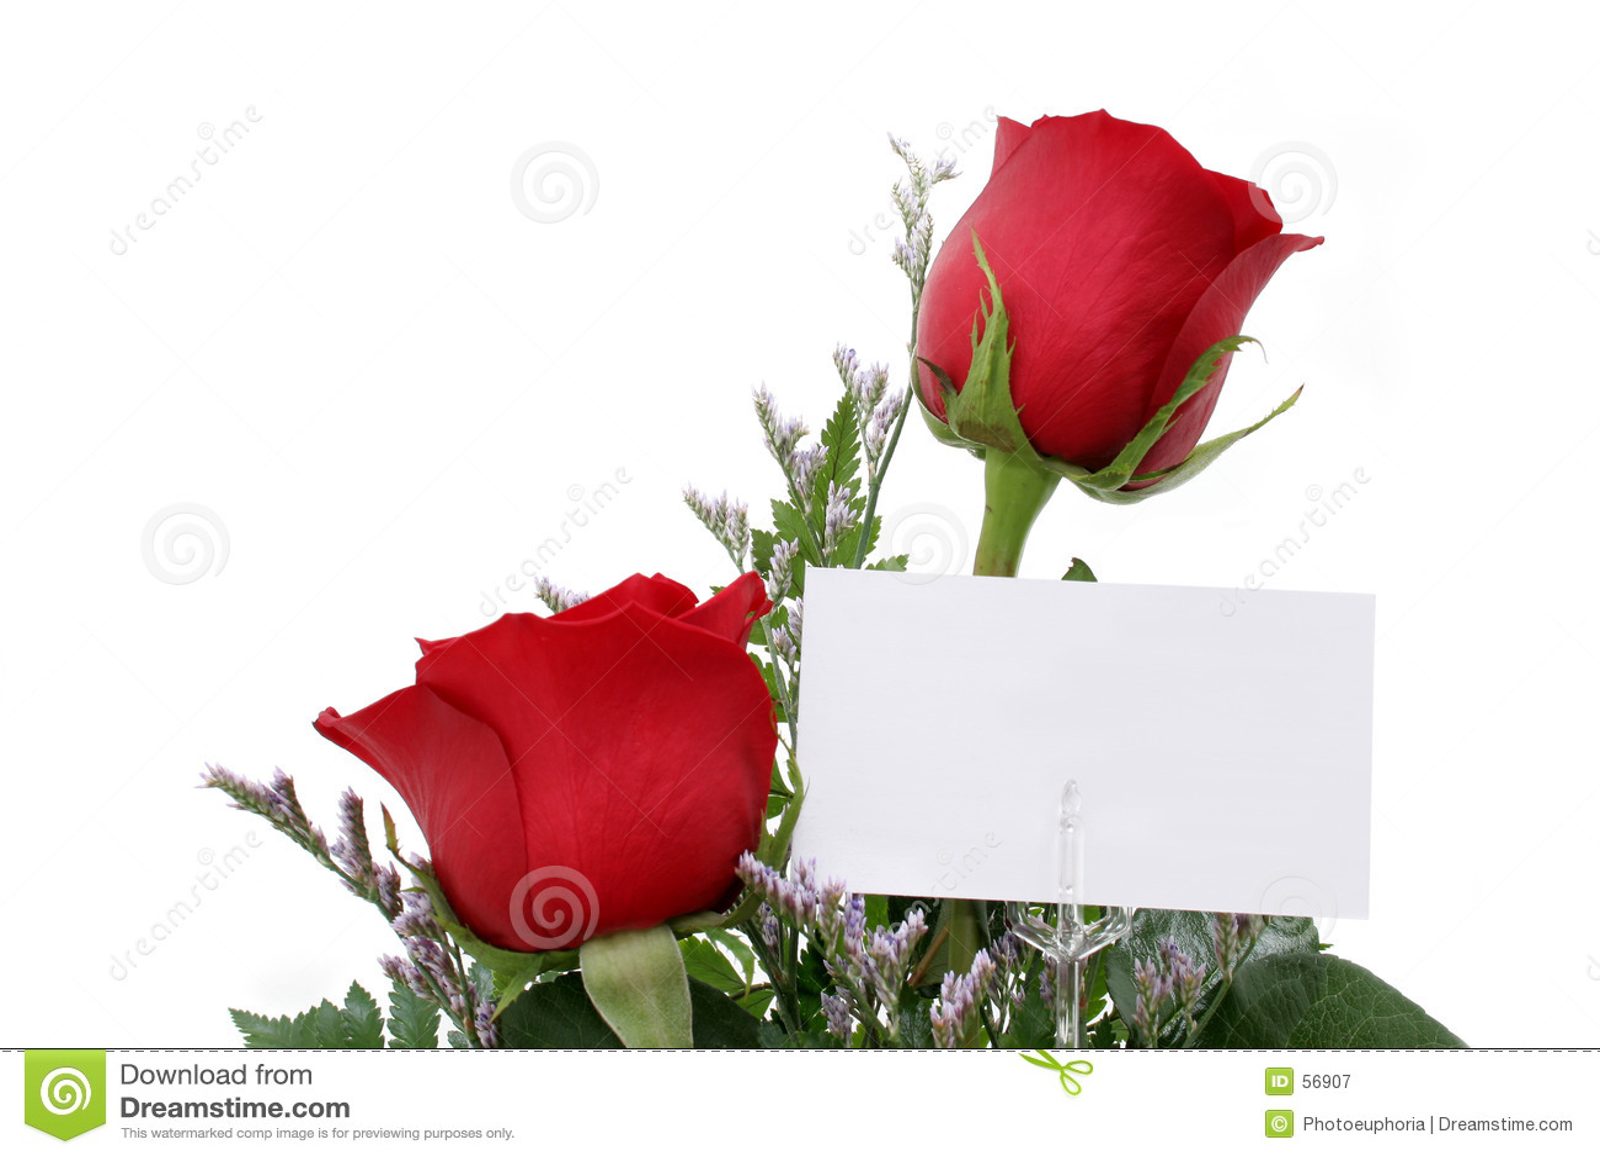 Rosas con la tarjeta del regalo (imagen 8.2mp)